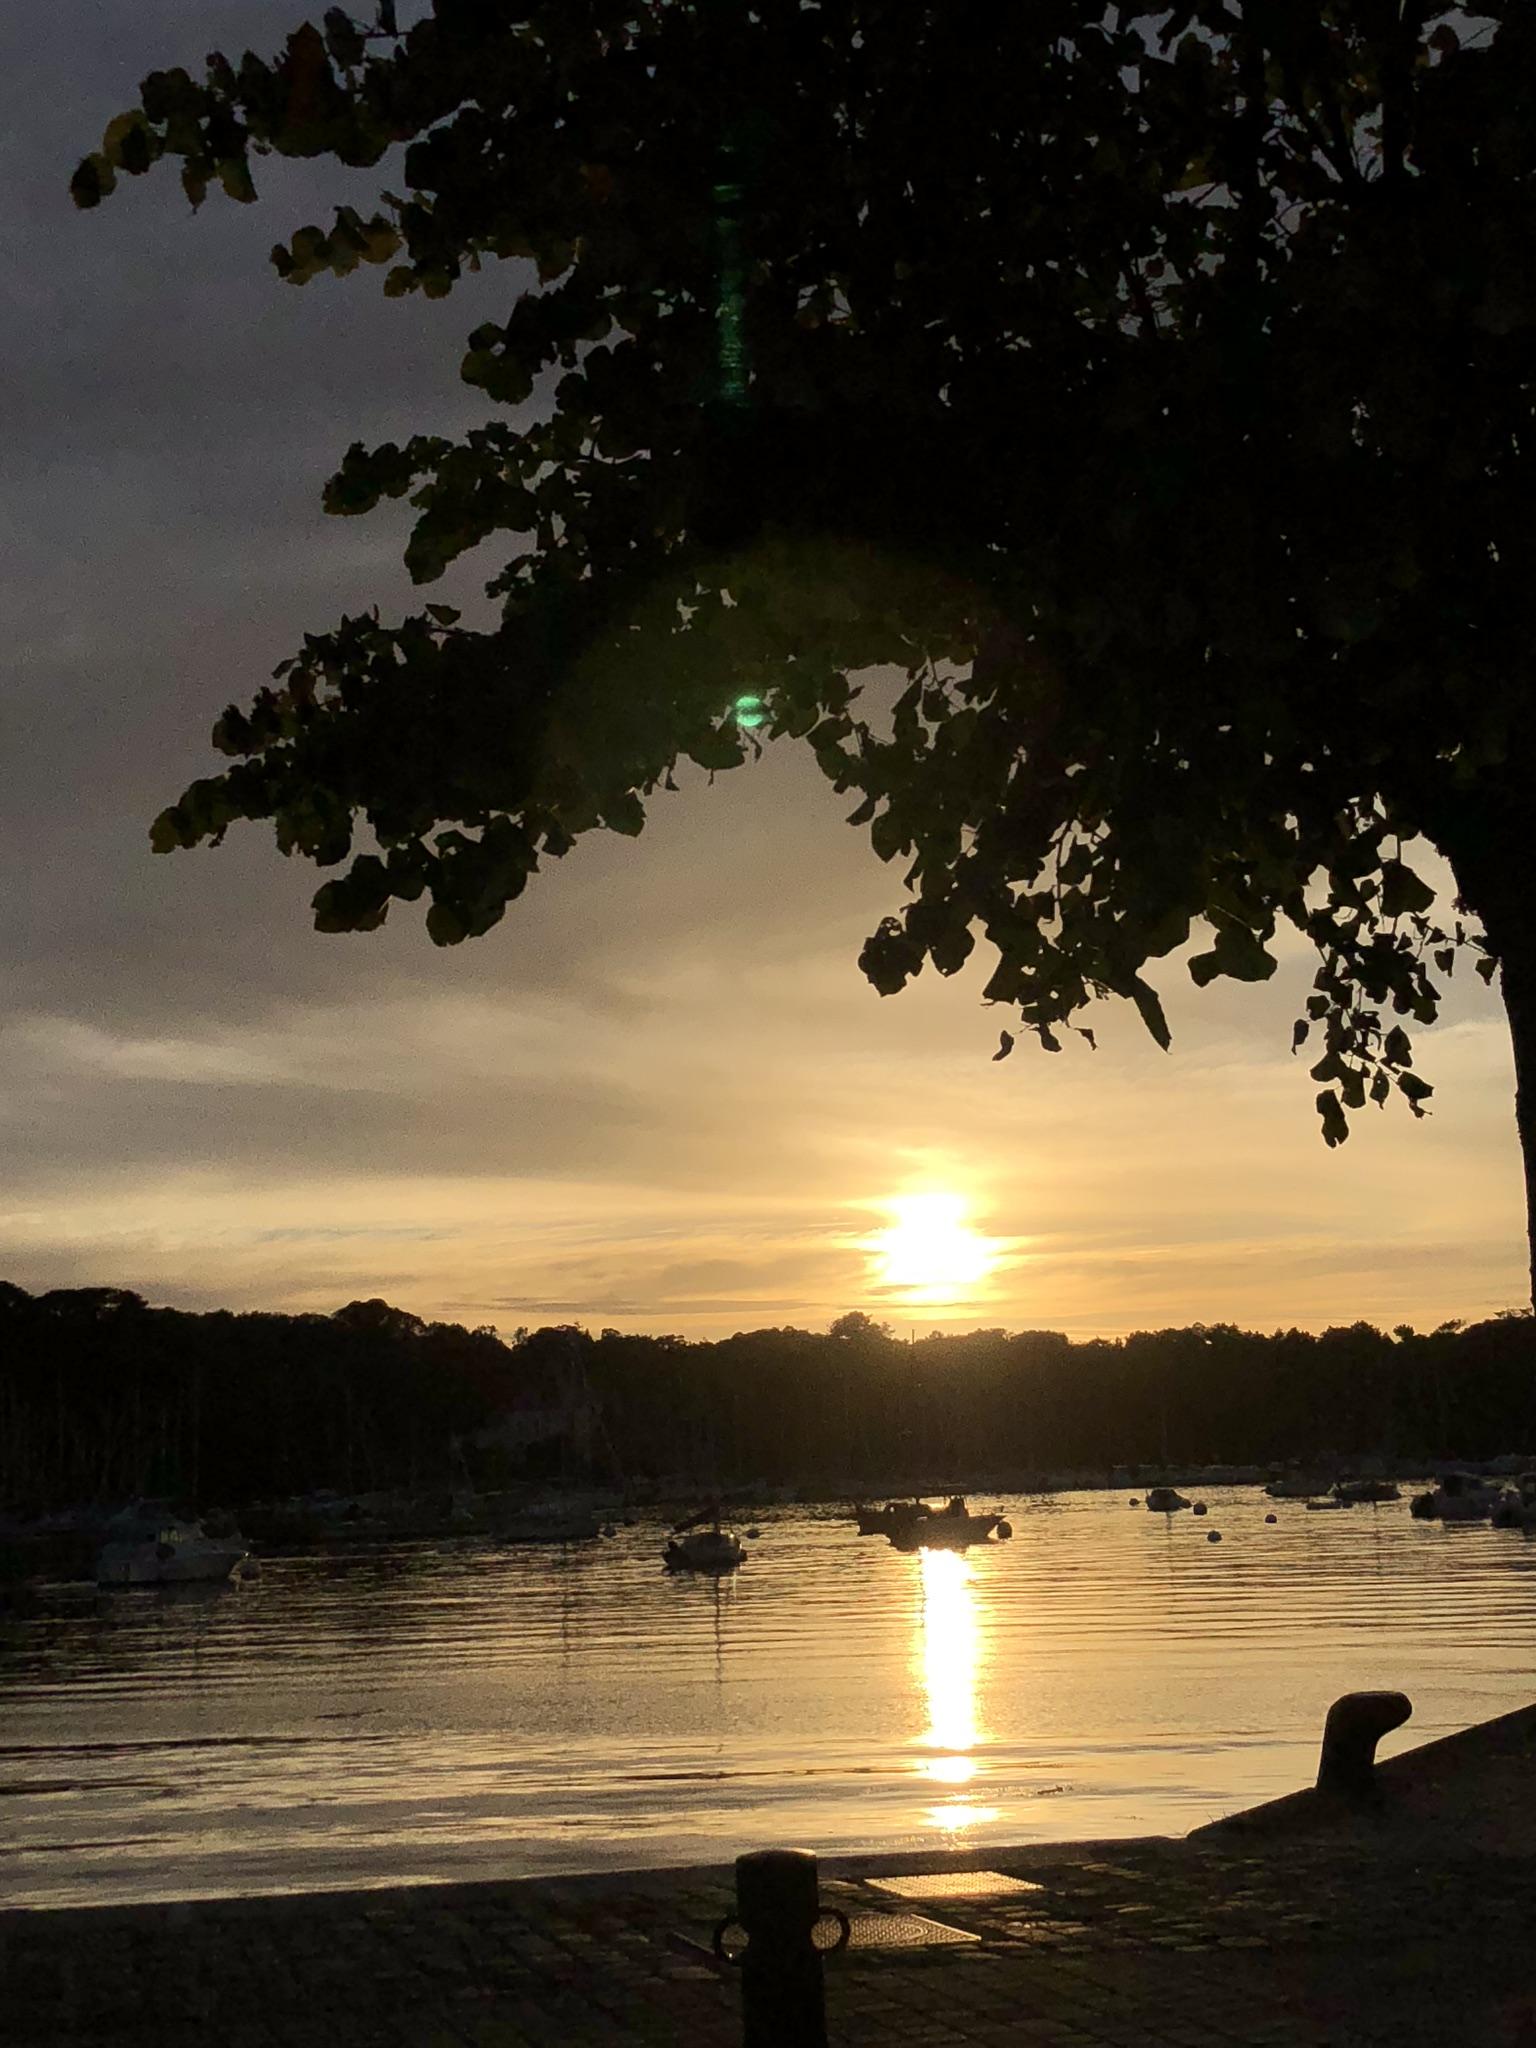 The sun setting over Benodet marina.